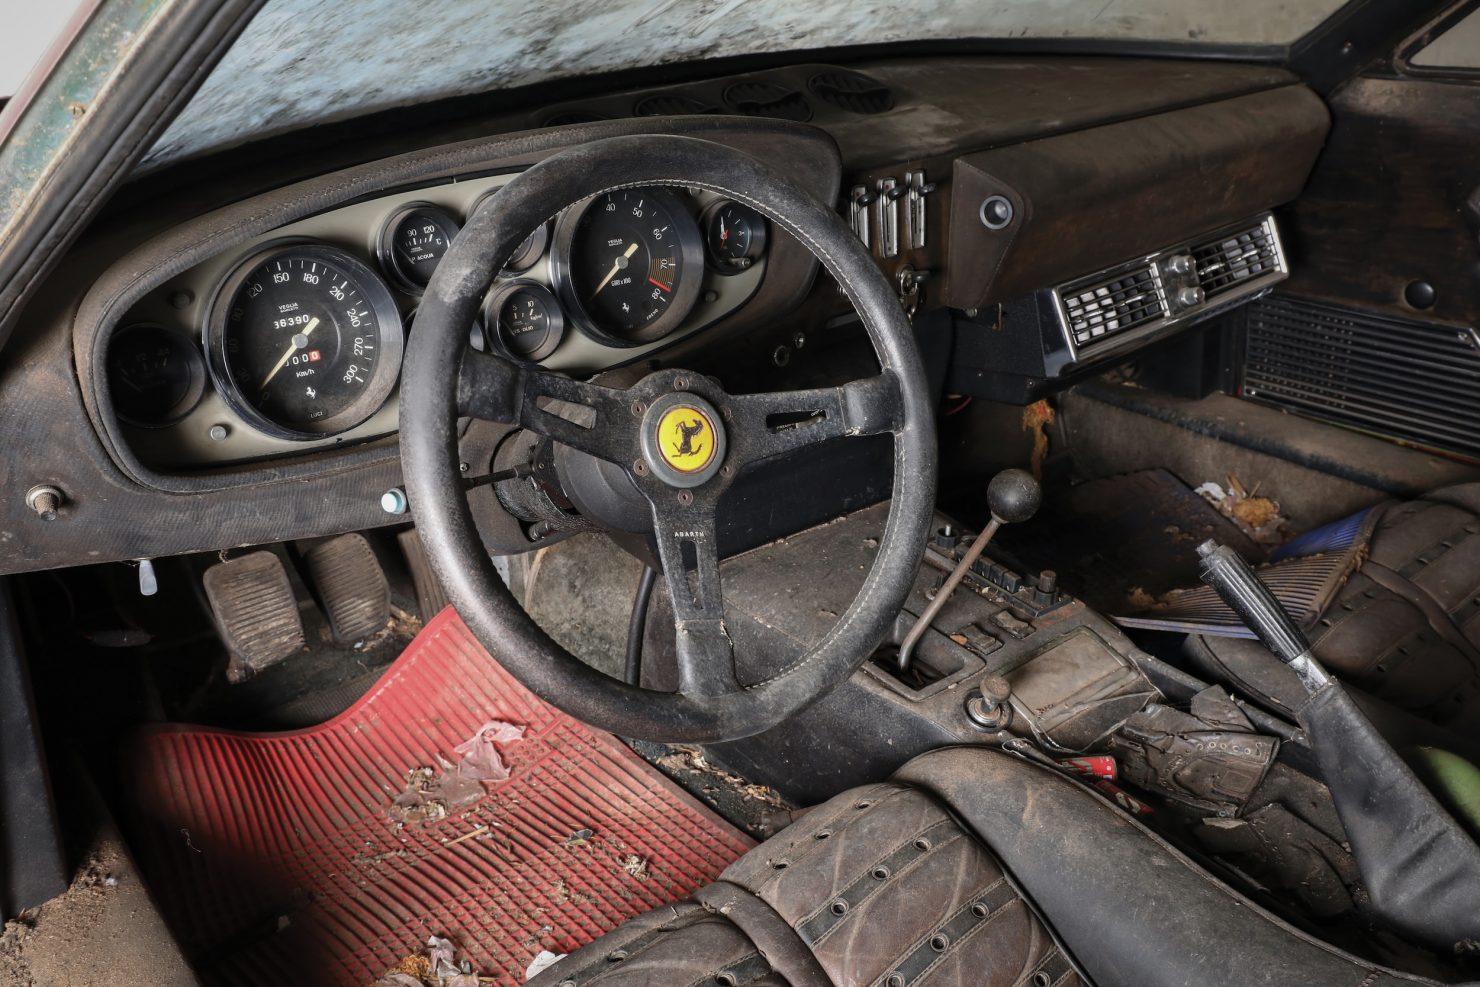 Ferrari 365 GTB4 Daytona Alloy 6 1480x987 - Barn Find: 1969 Ferrari 365 GTB/4 Daytona Alloy